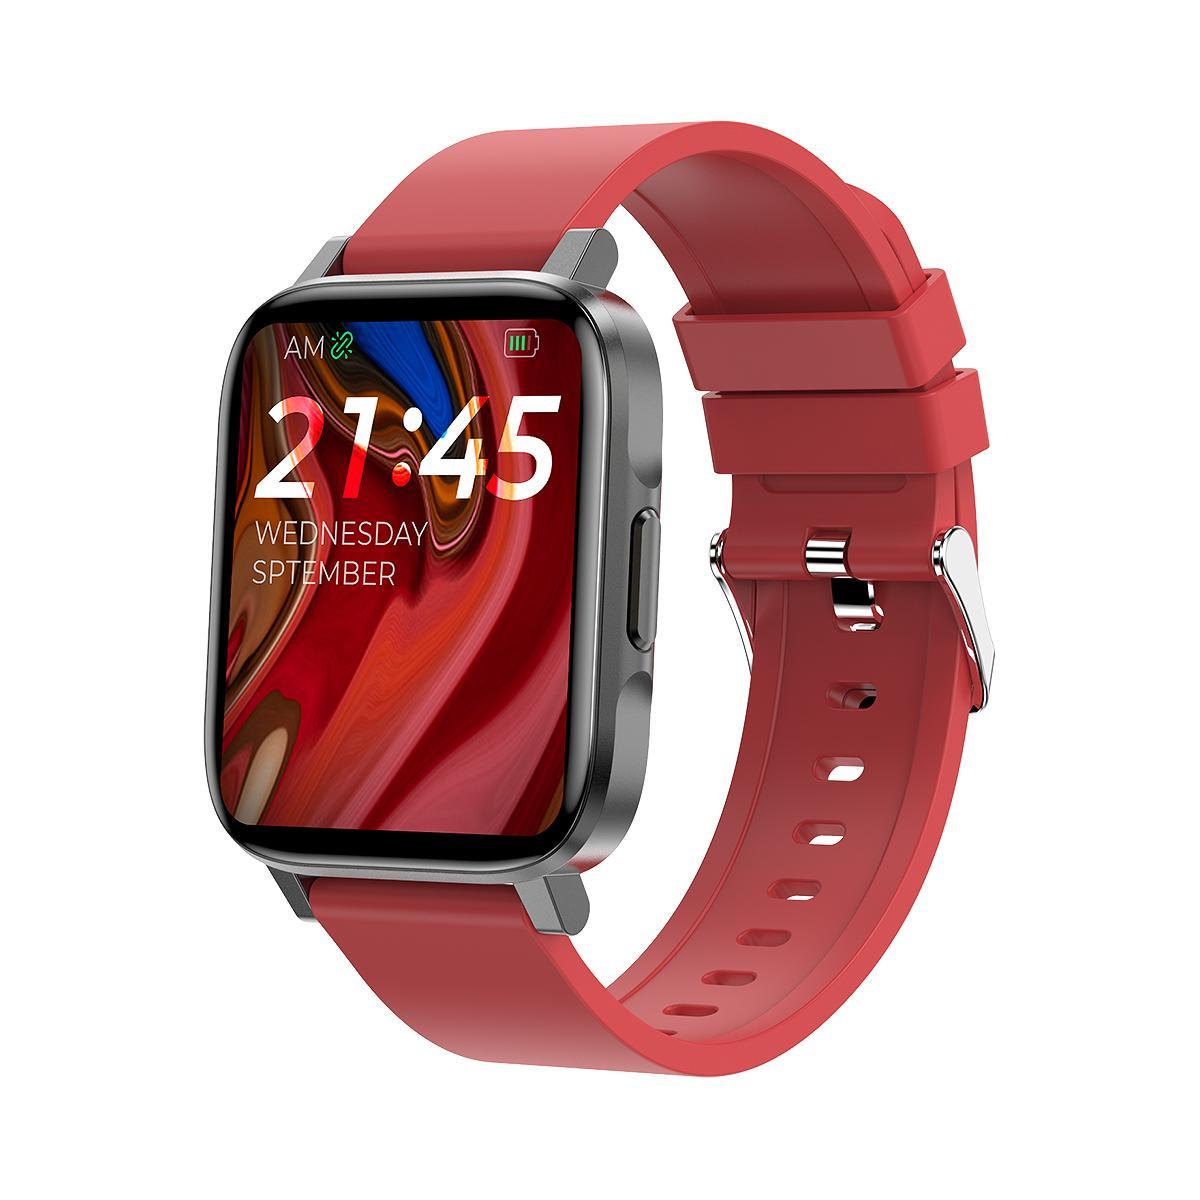 G51 local music palyer digital smart watch 1